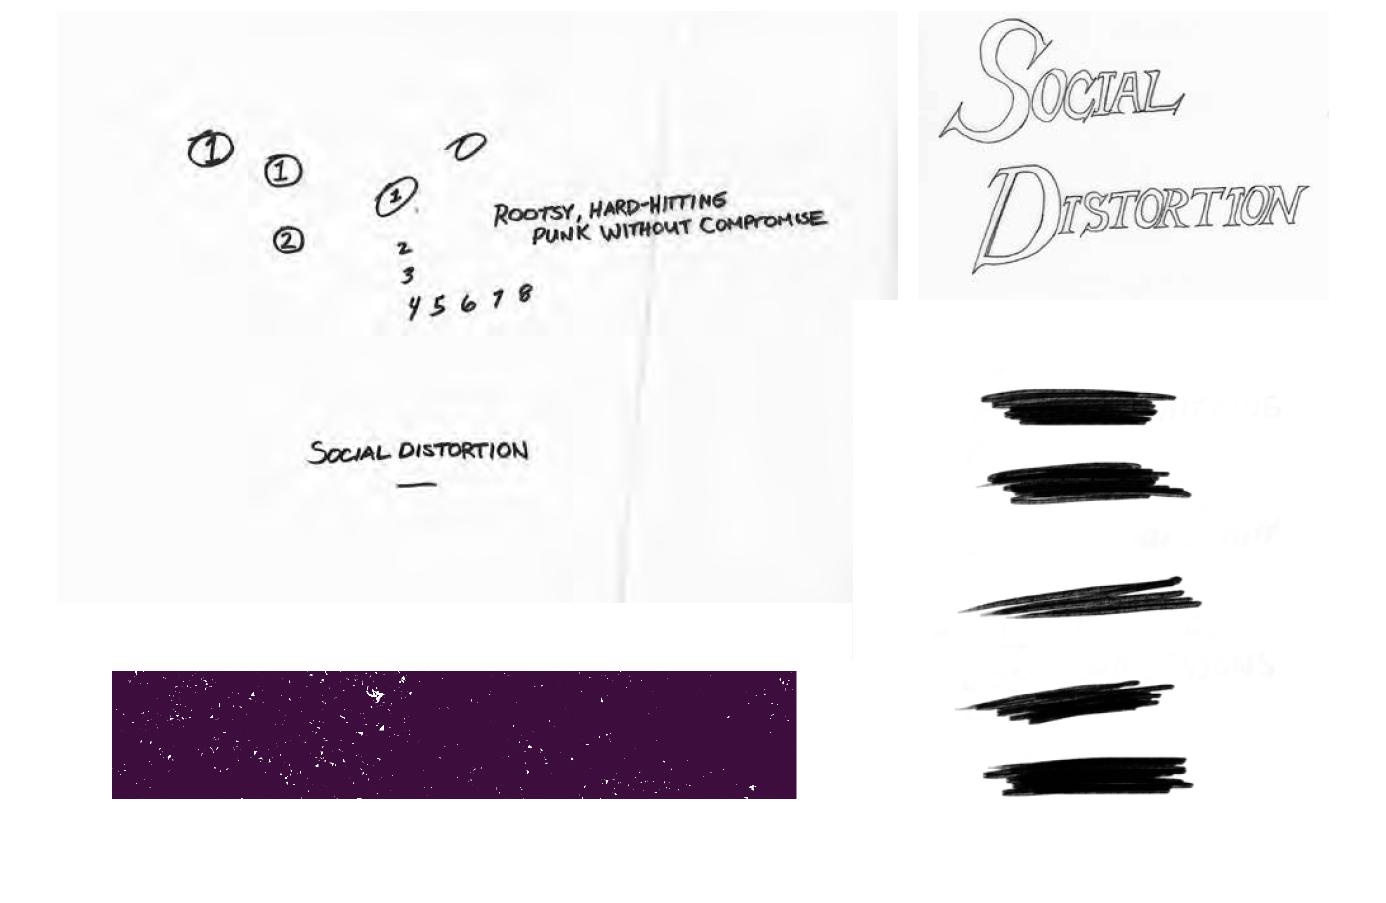 Design element planning